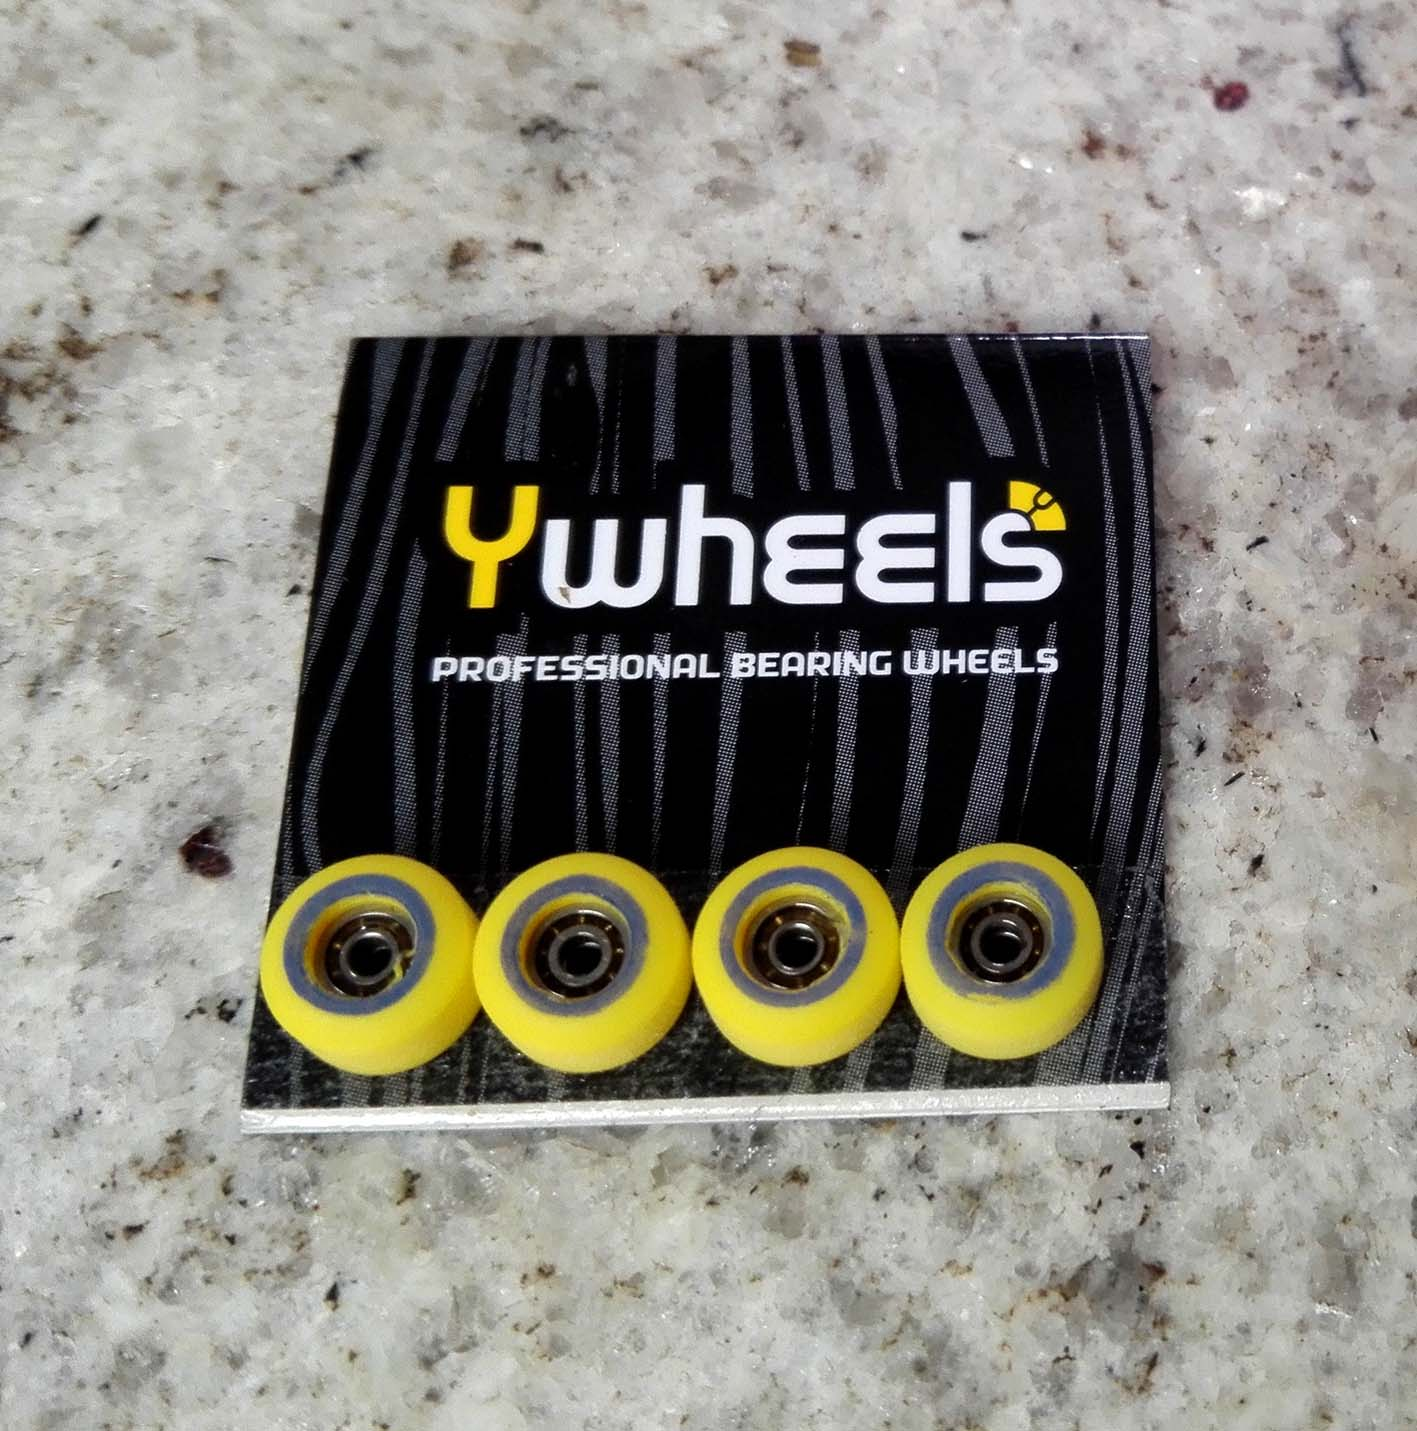 YWHEELS DUAL CLASSIC YELLOW : 34,90 € ($ 42,70)